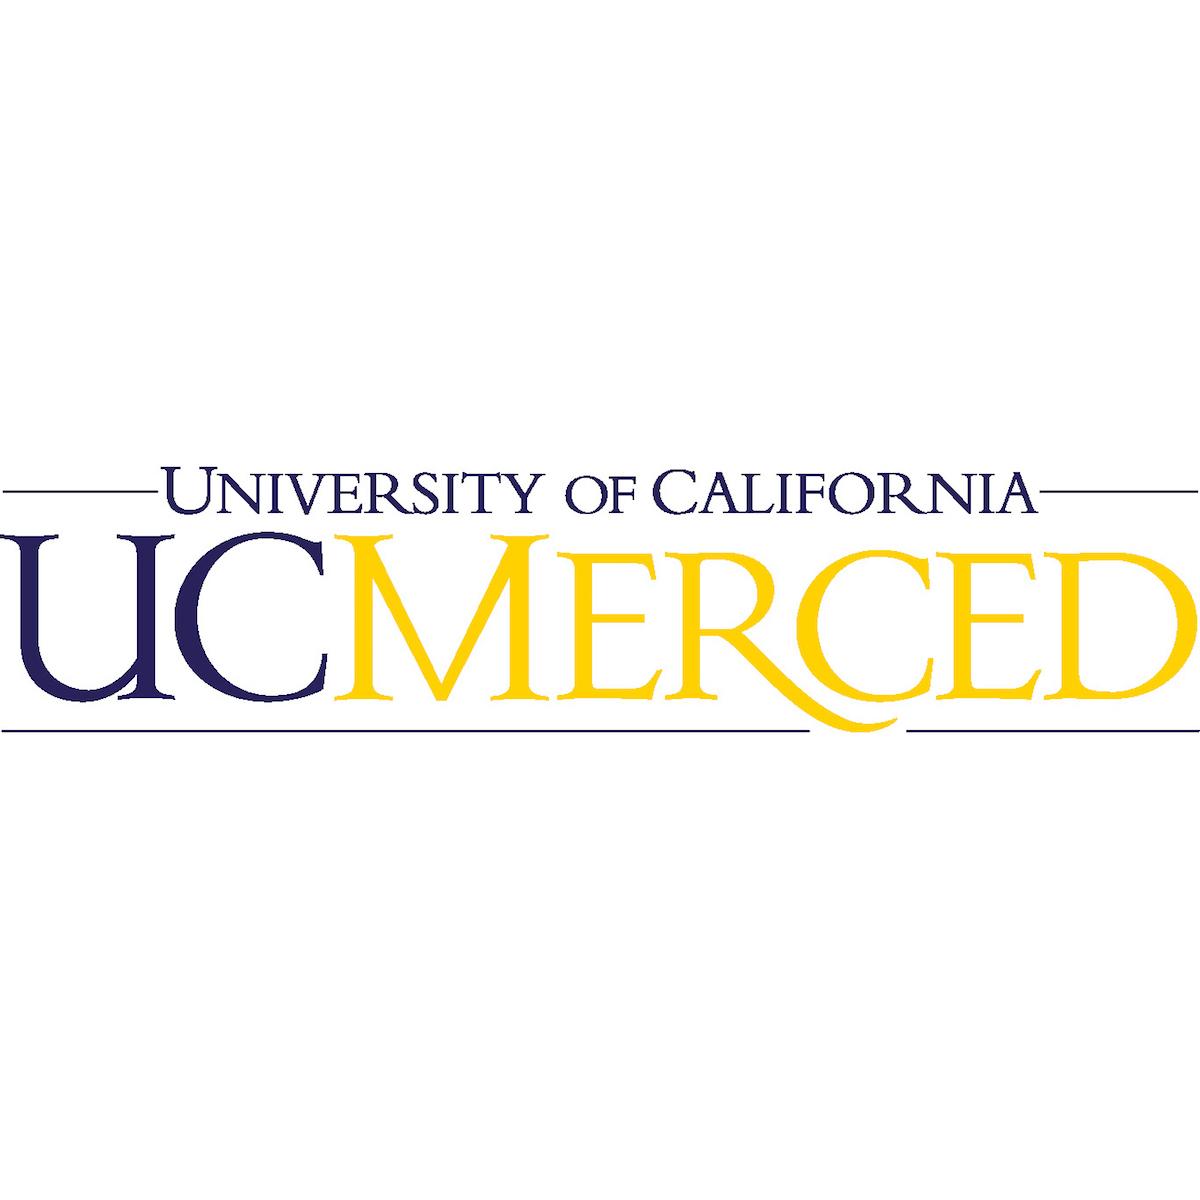 community service includes advising UC Merced's School of Engineering